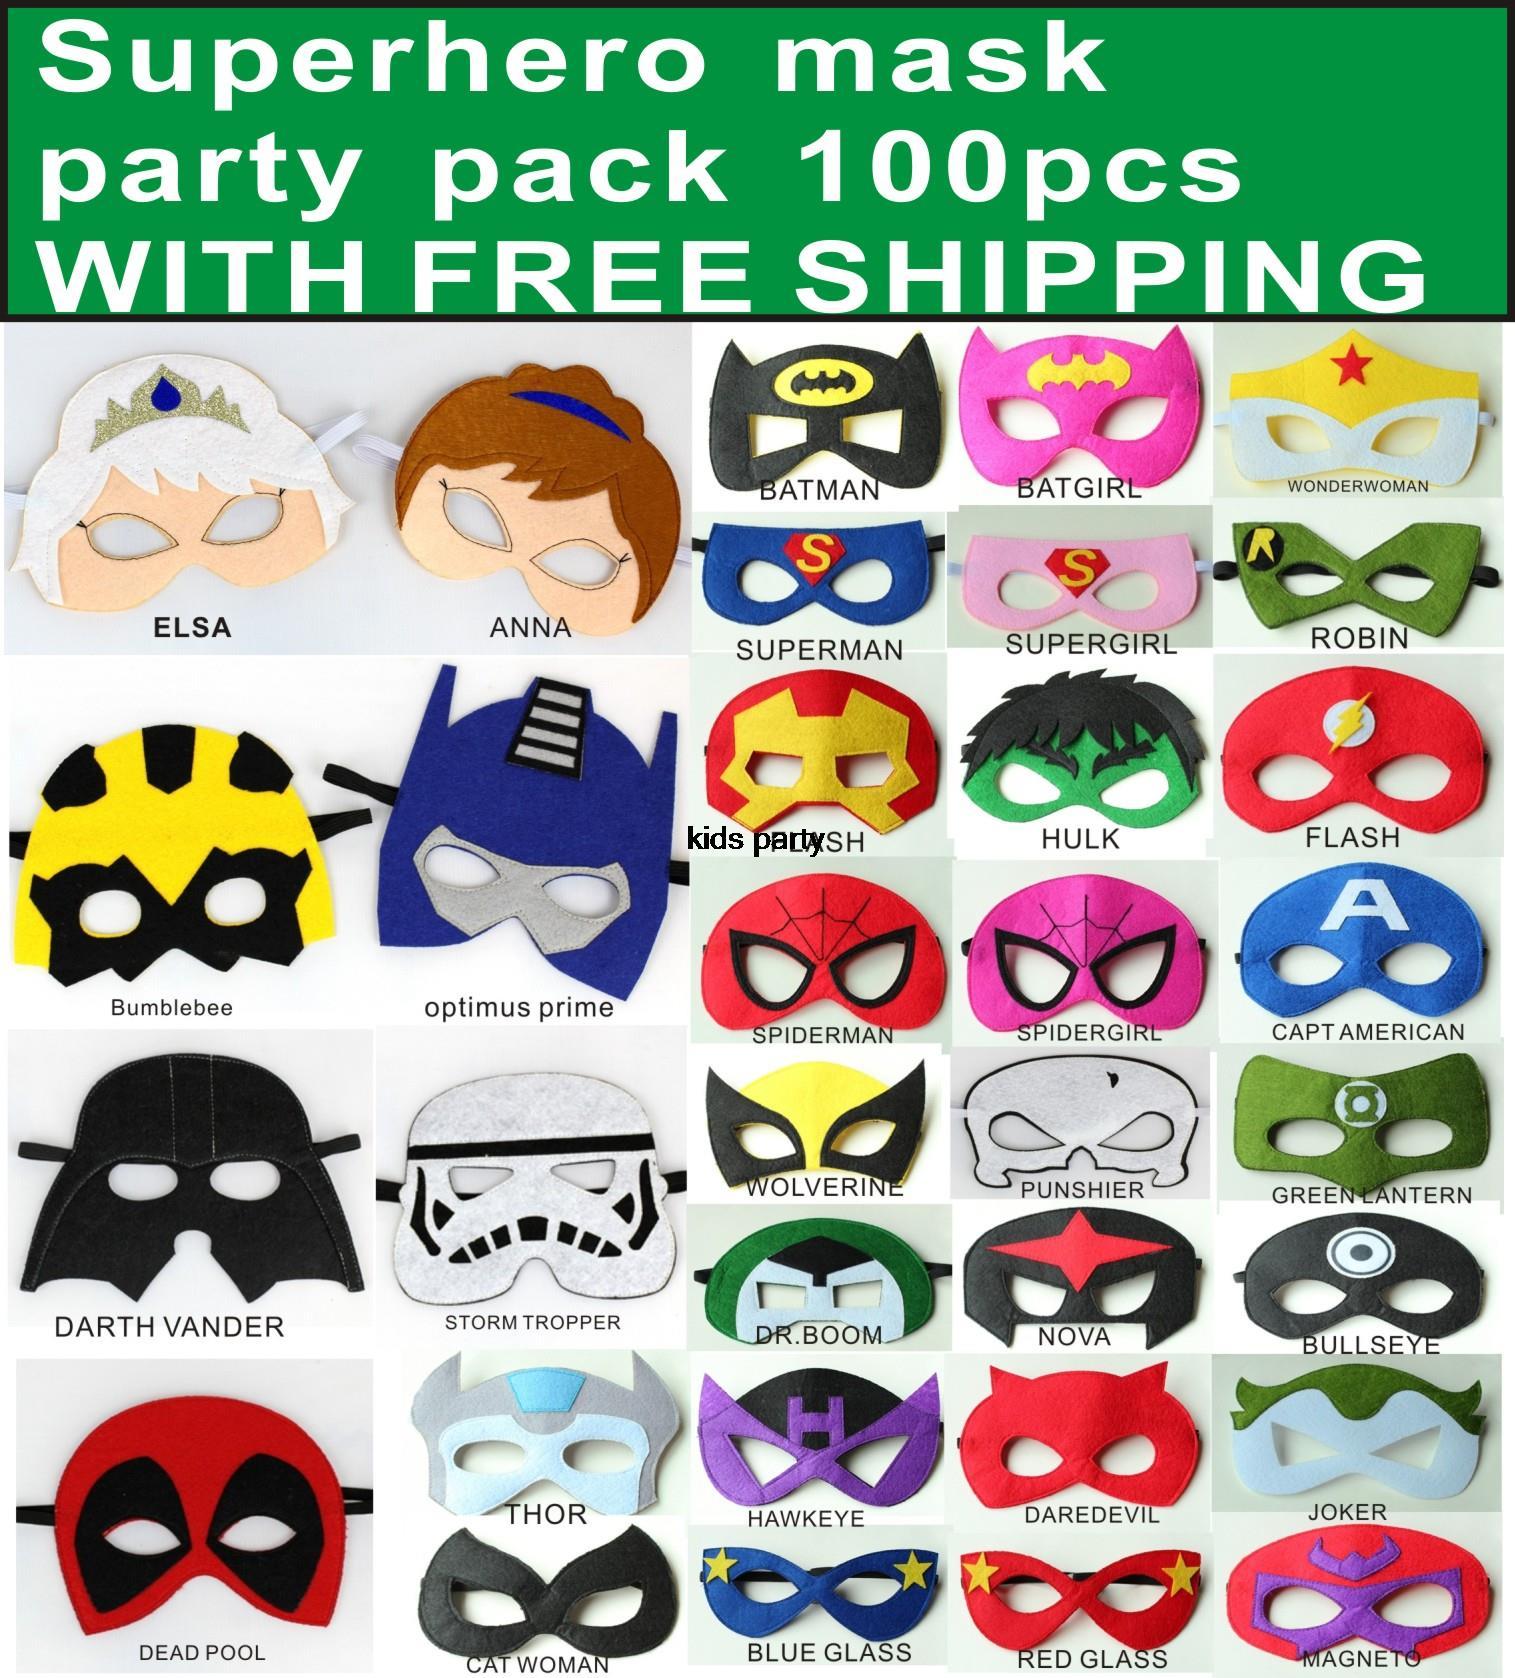 100pcs felt mask hallown mask costume mask kids costume accessories batman elsa&amp;anna  deadpool tmnt starwars darth vader stormОдежда и ак�е��уары<br><br><br>Aliexpress